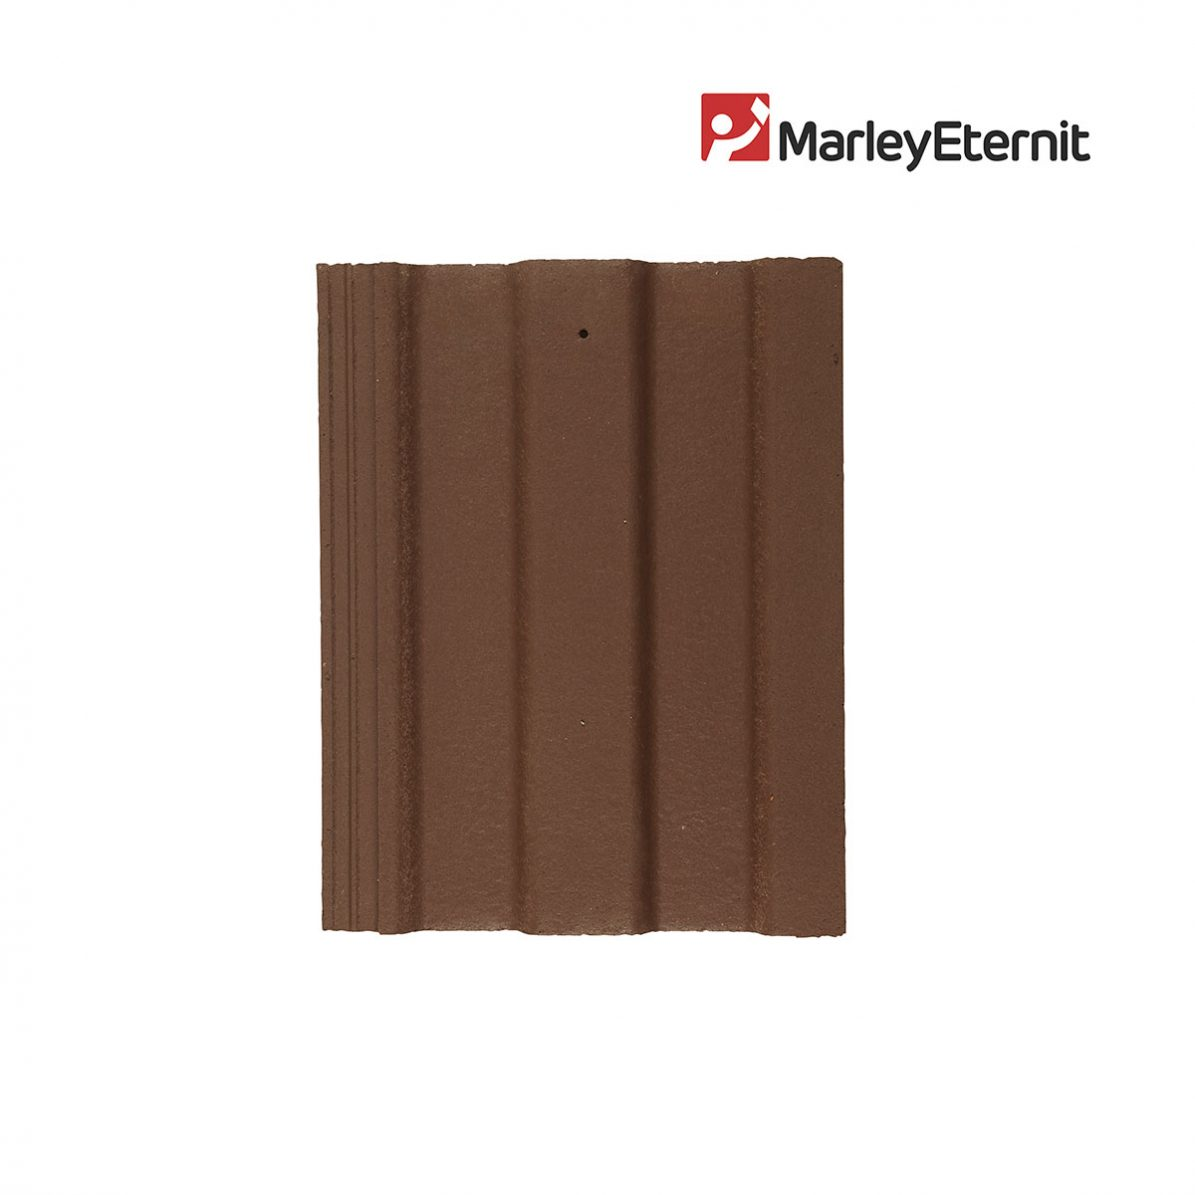 Marley Eternit Ludlow Major Concrete Interlocking Tiles Skyline Roofing